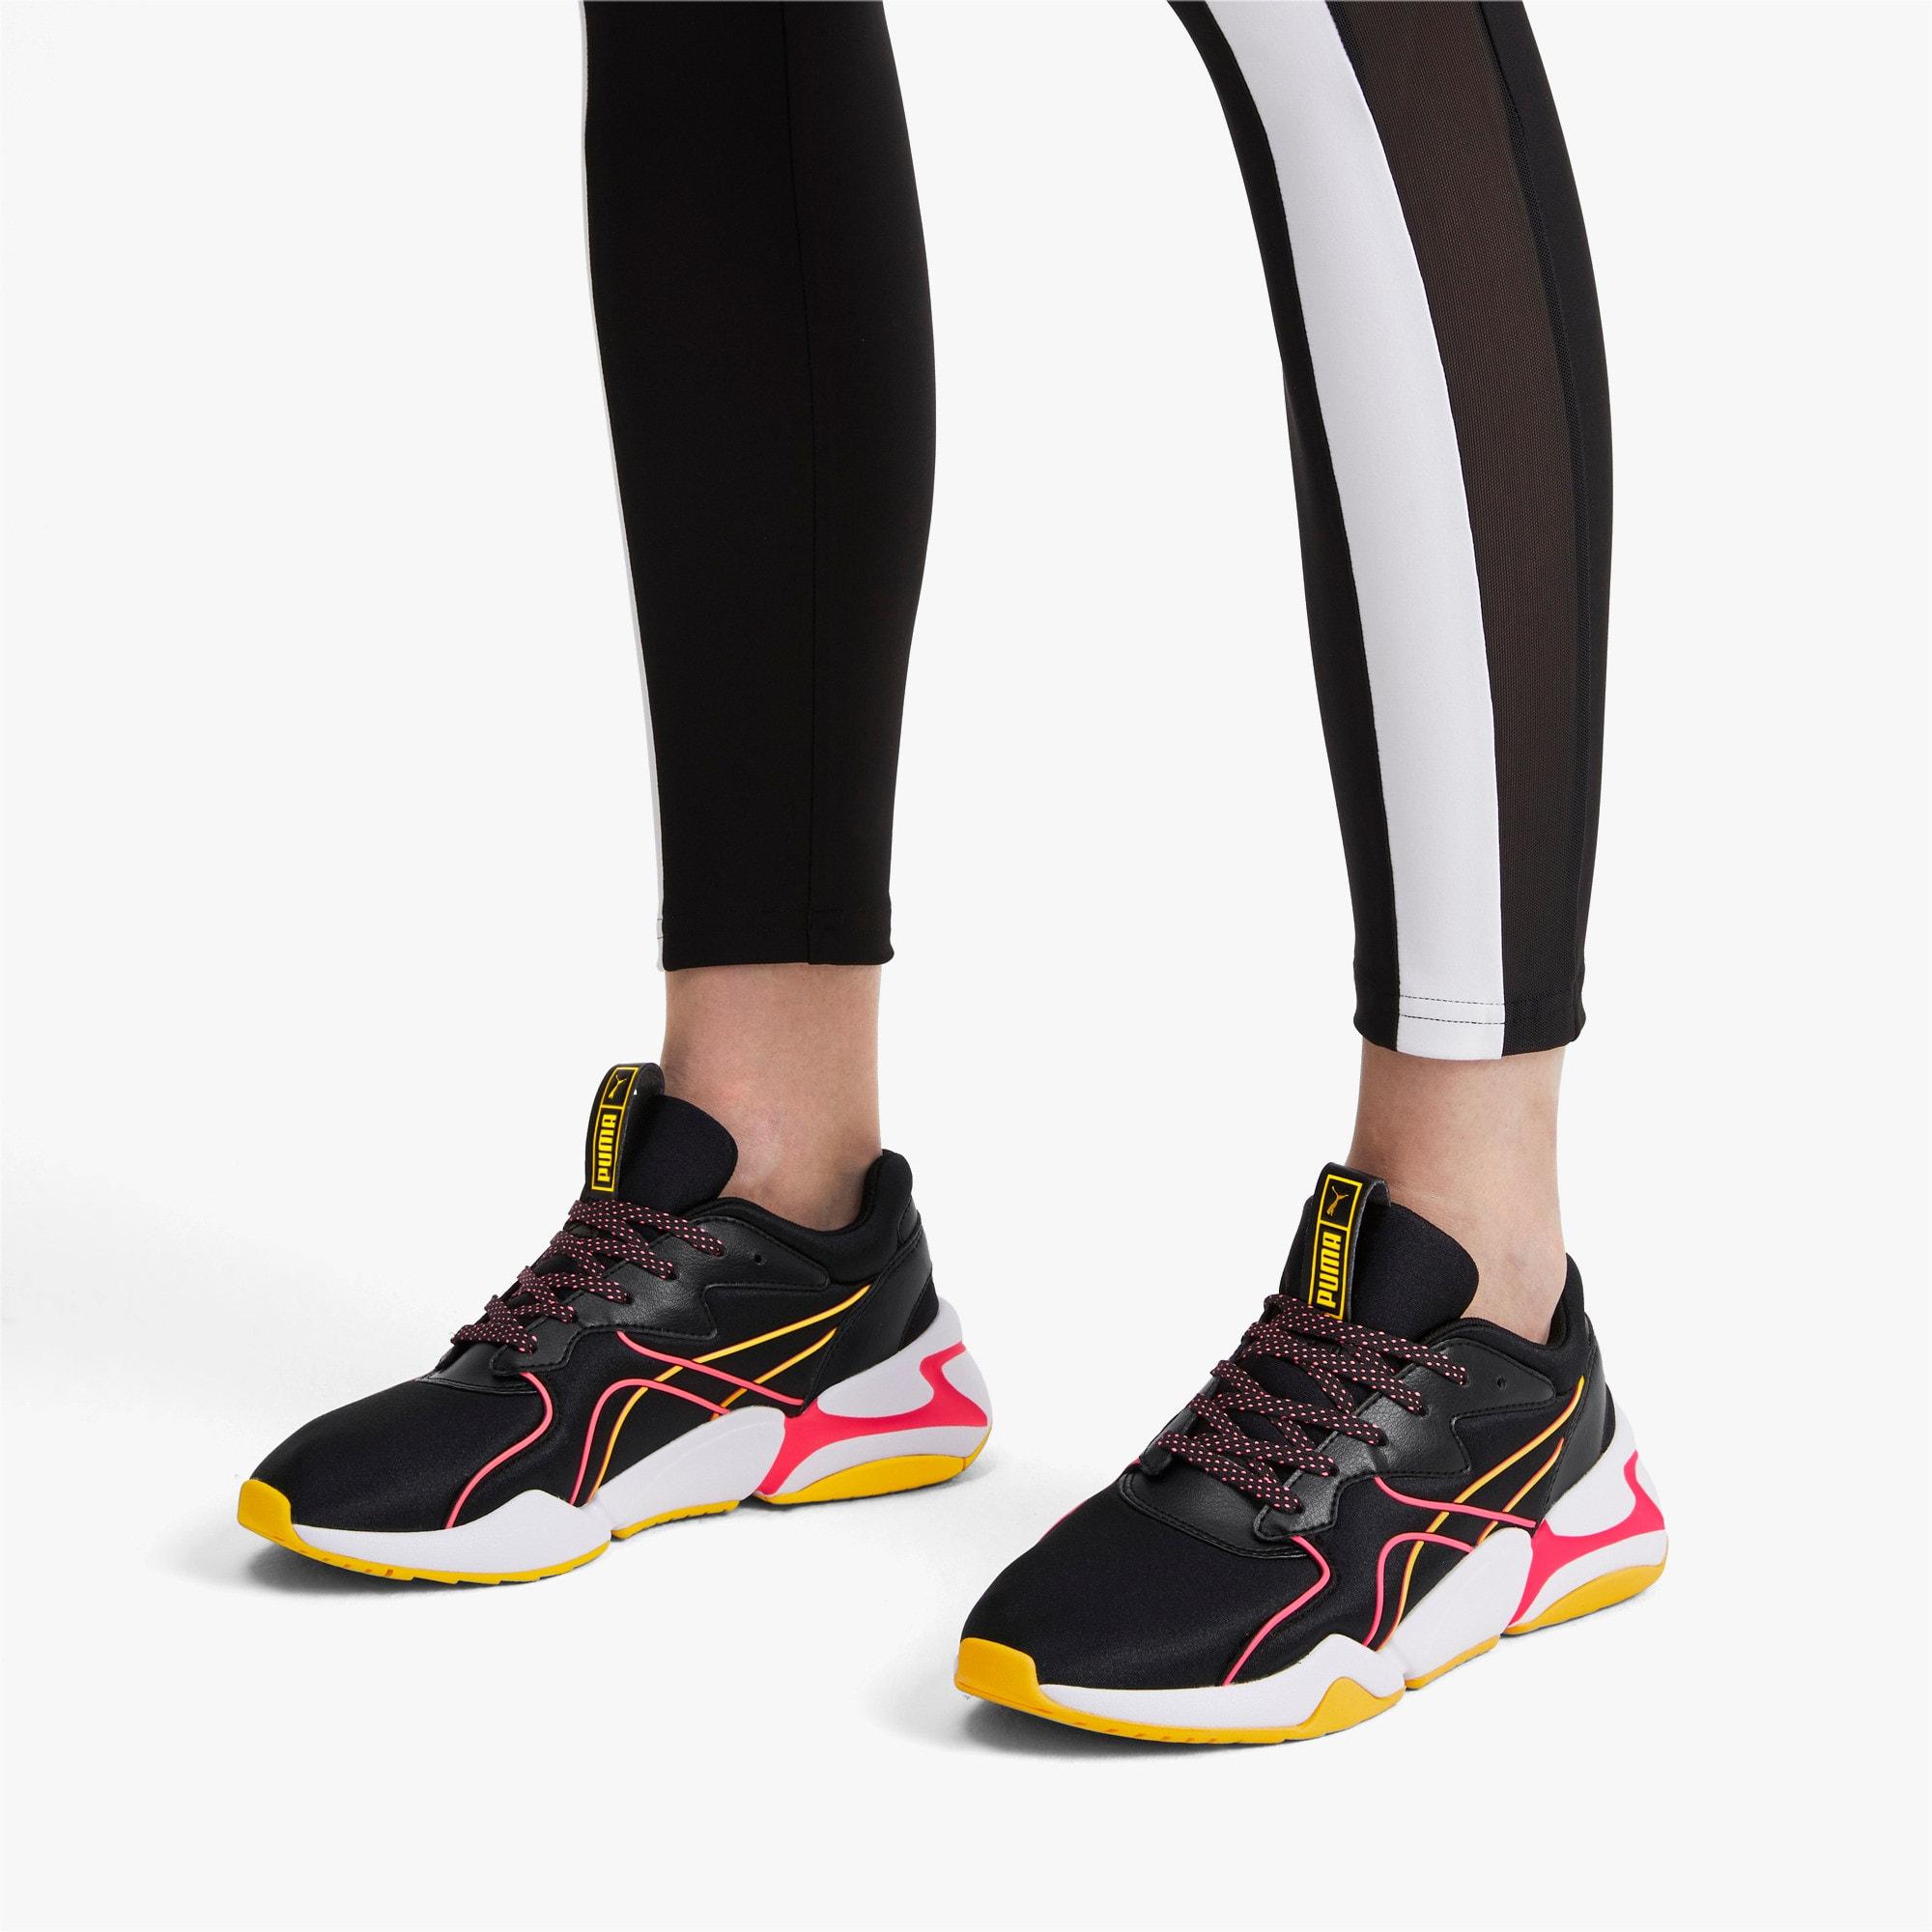 Thumbnail 2 of Nova Hypertech IMEVA sportschoenen voor dames, Puma Black, medium